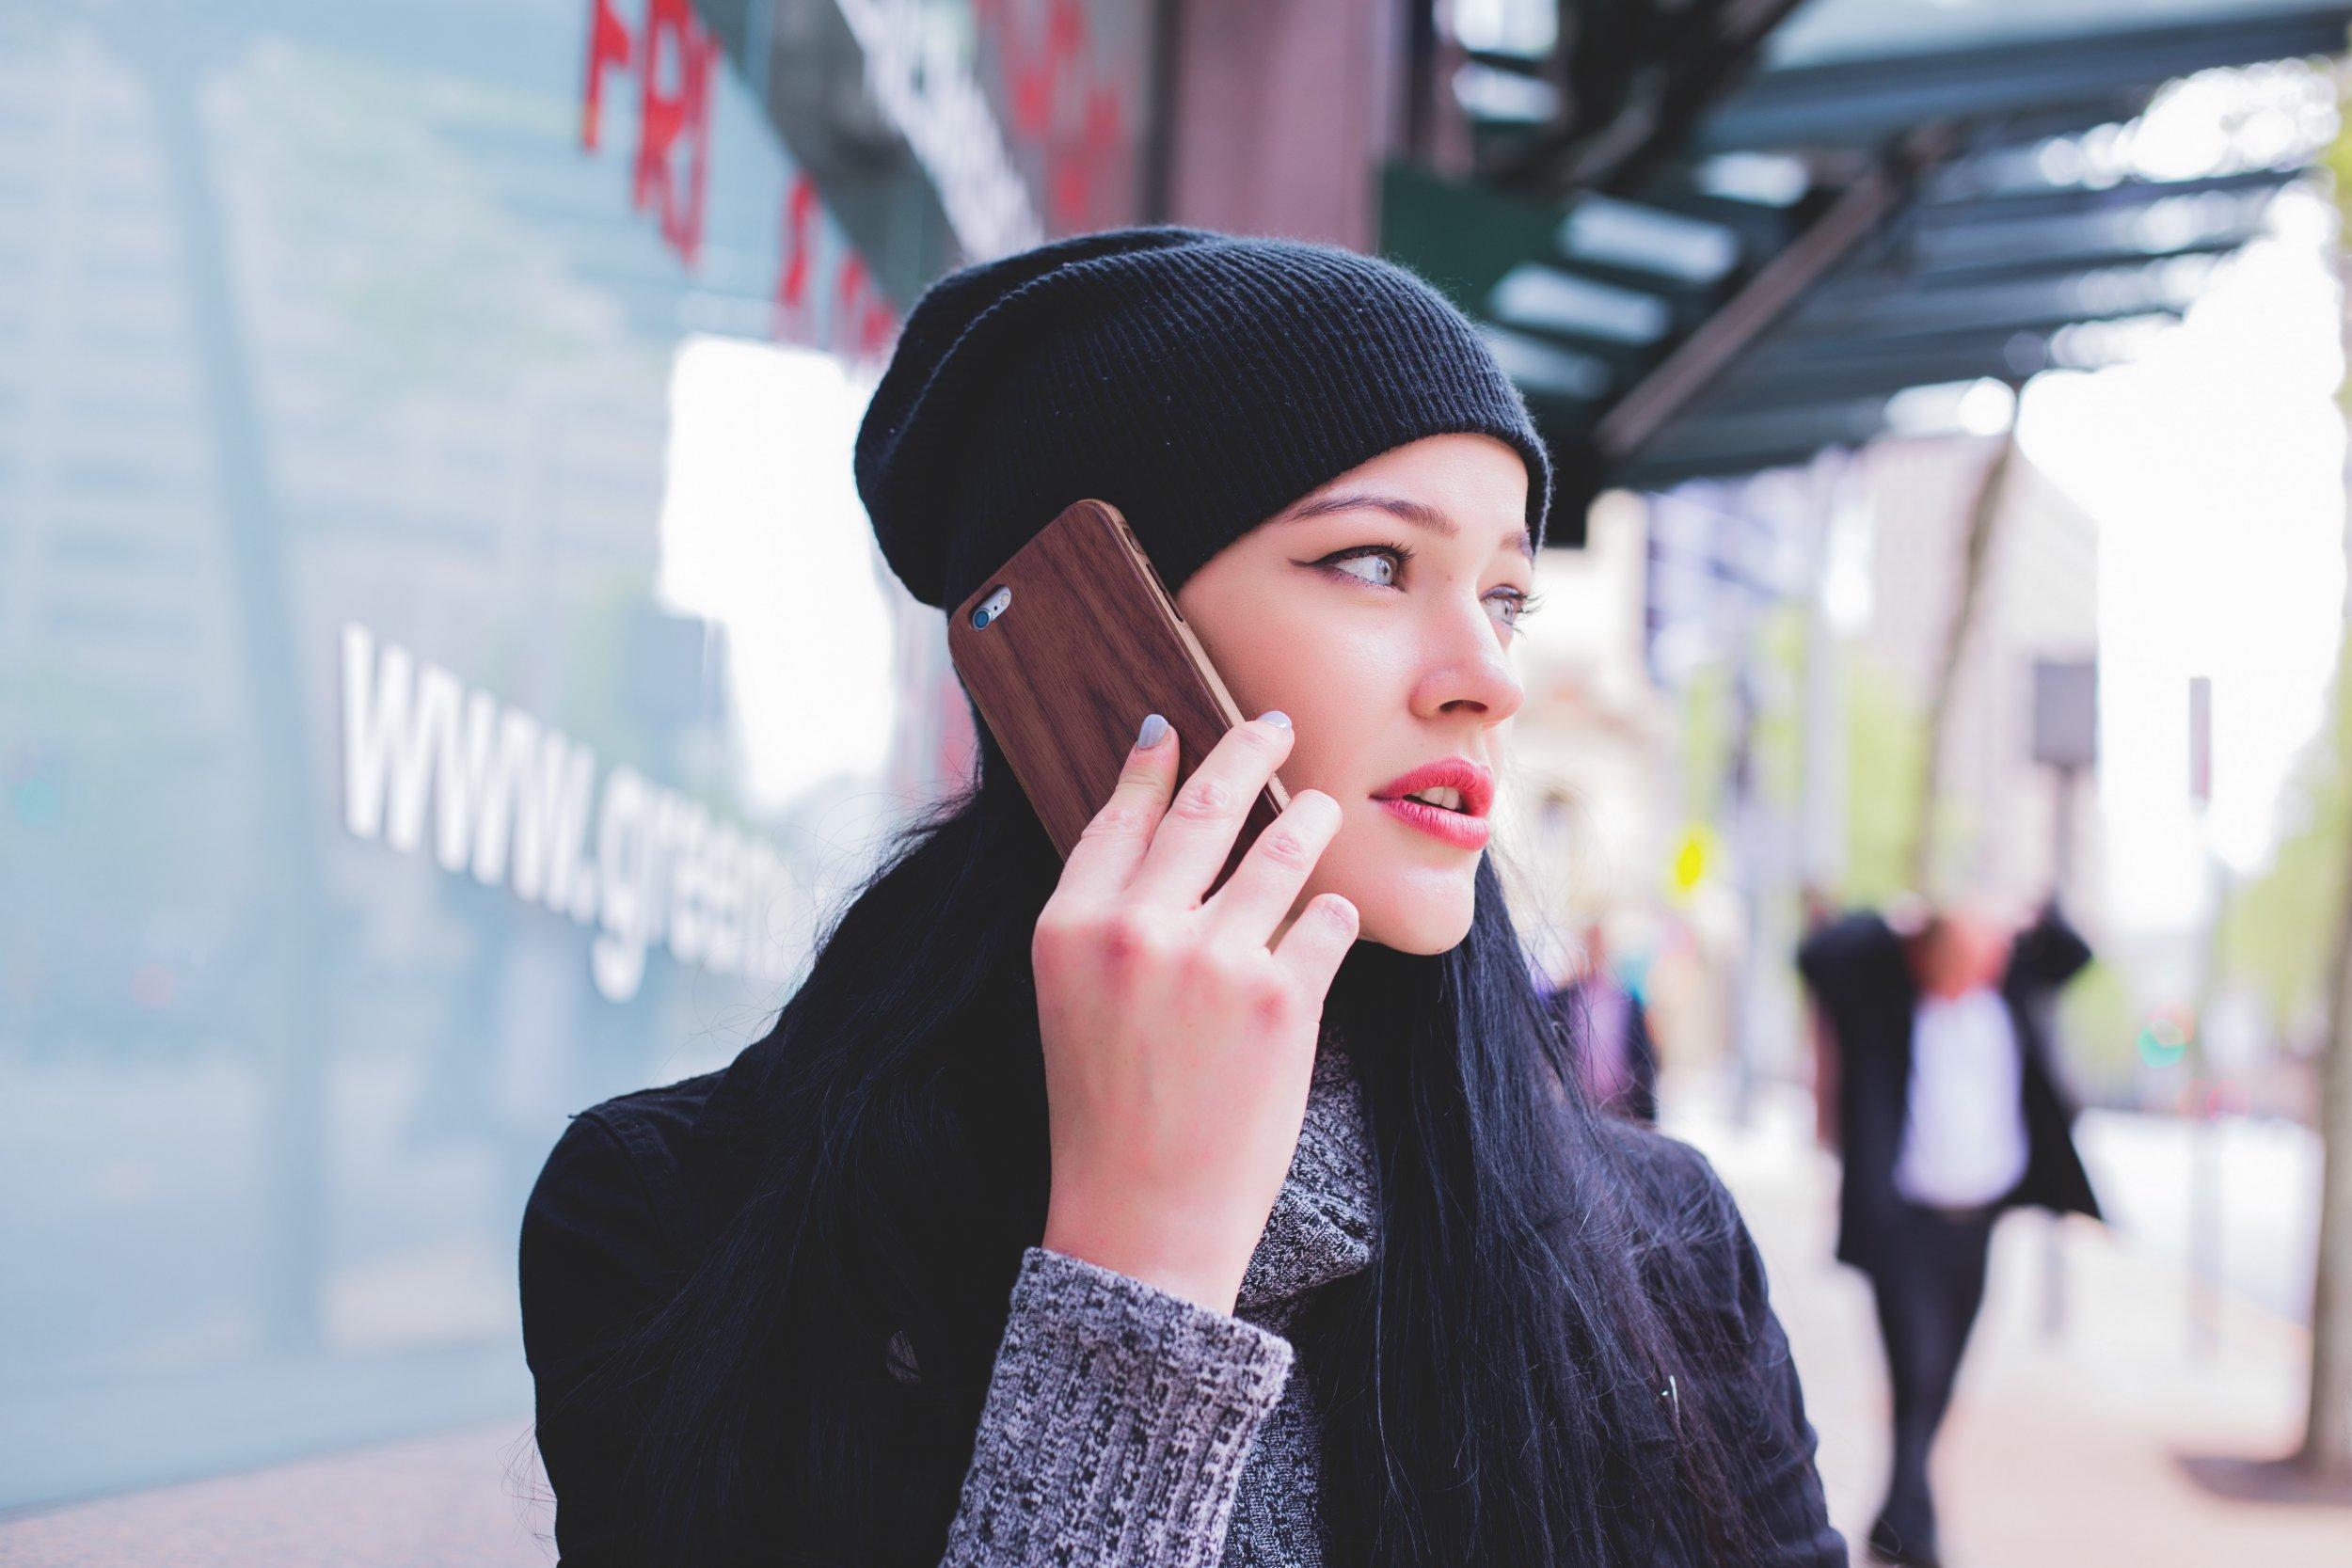 09_woman on phone_15_01